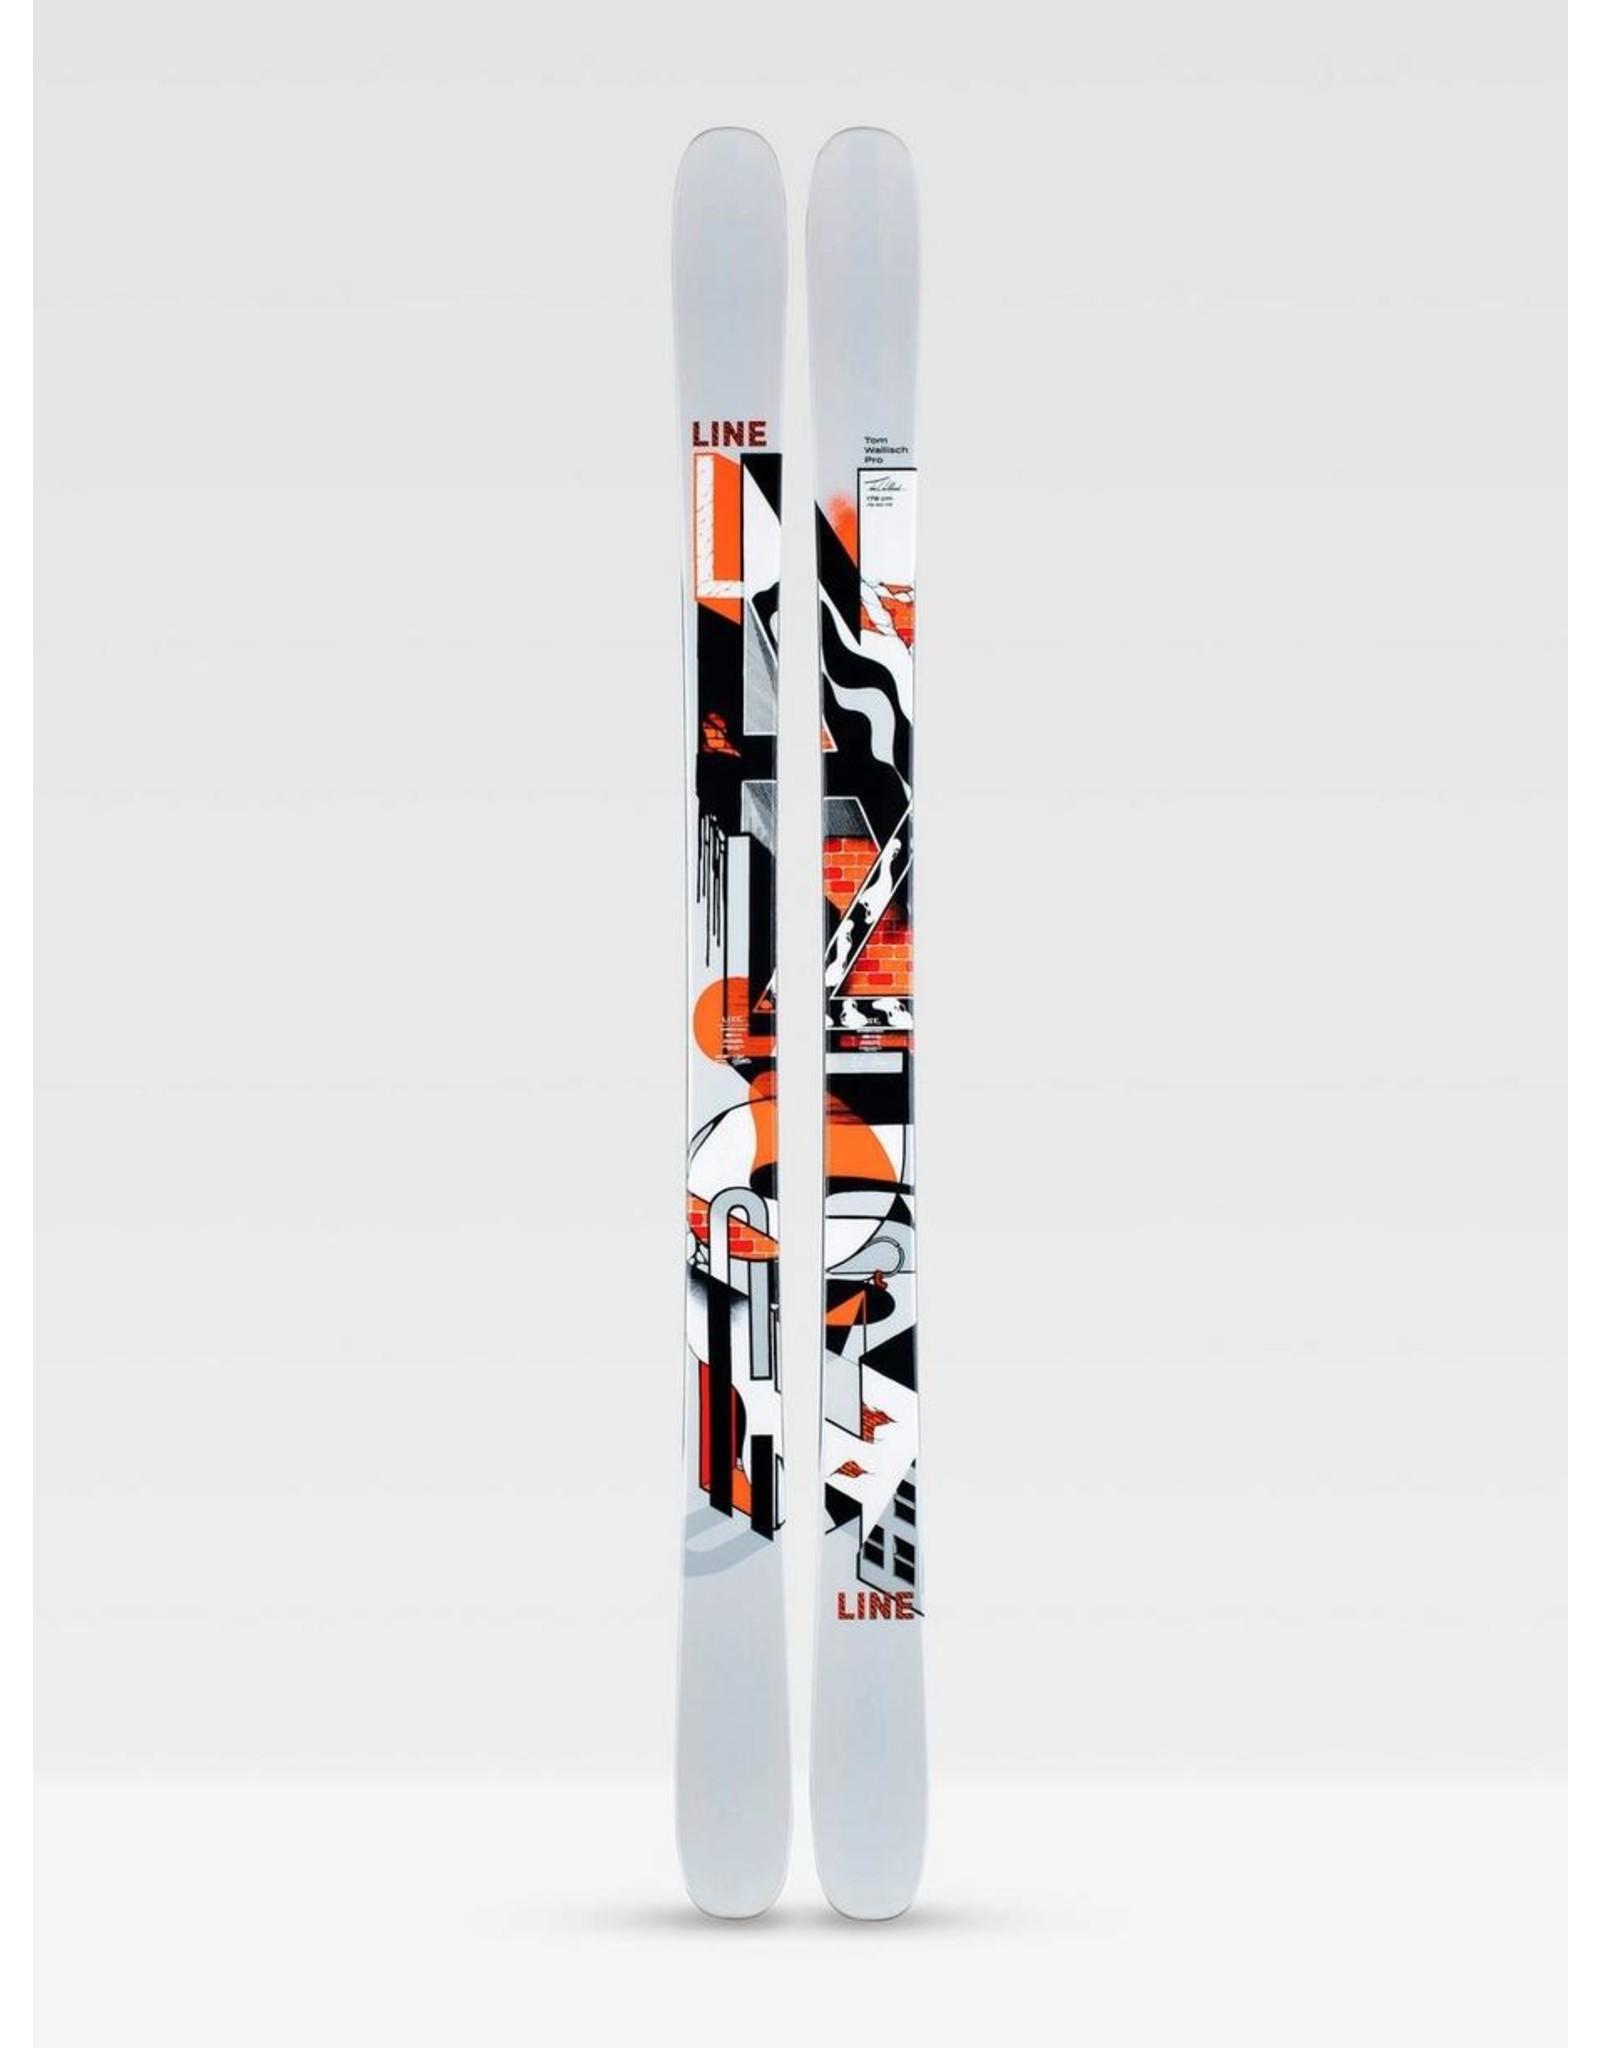 Line Skis Line Men's Tom Wallisch Pro Ski 2021